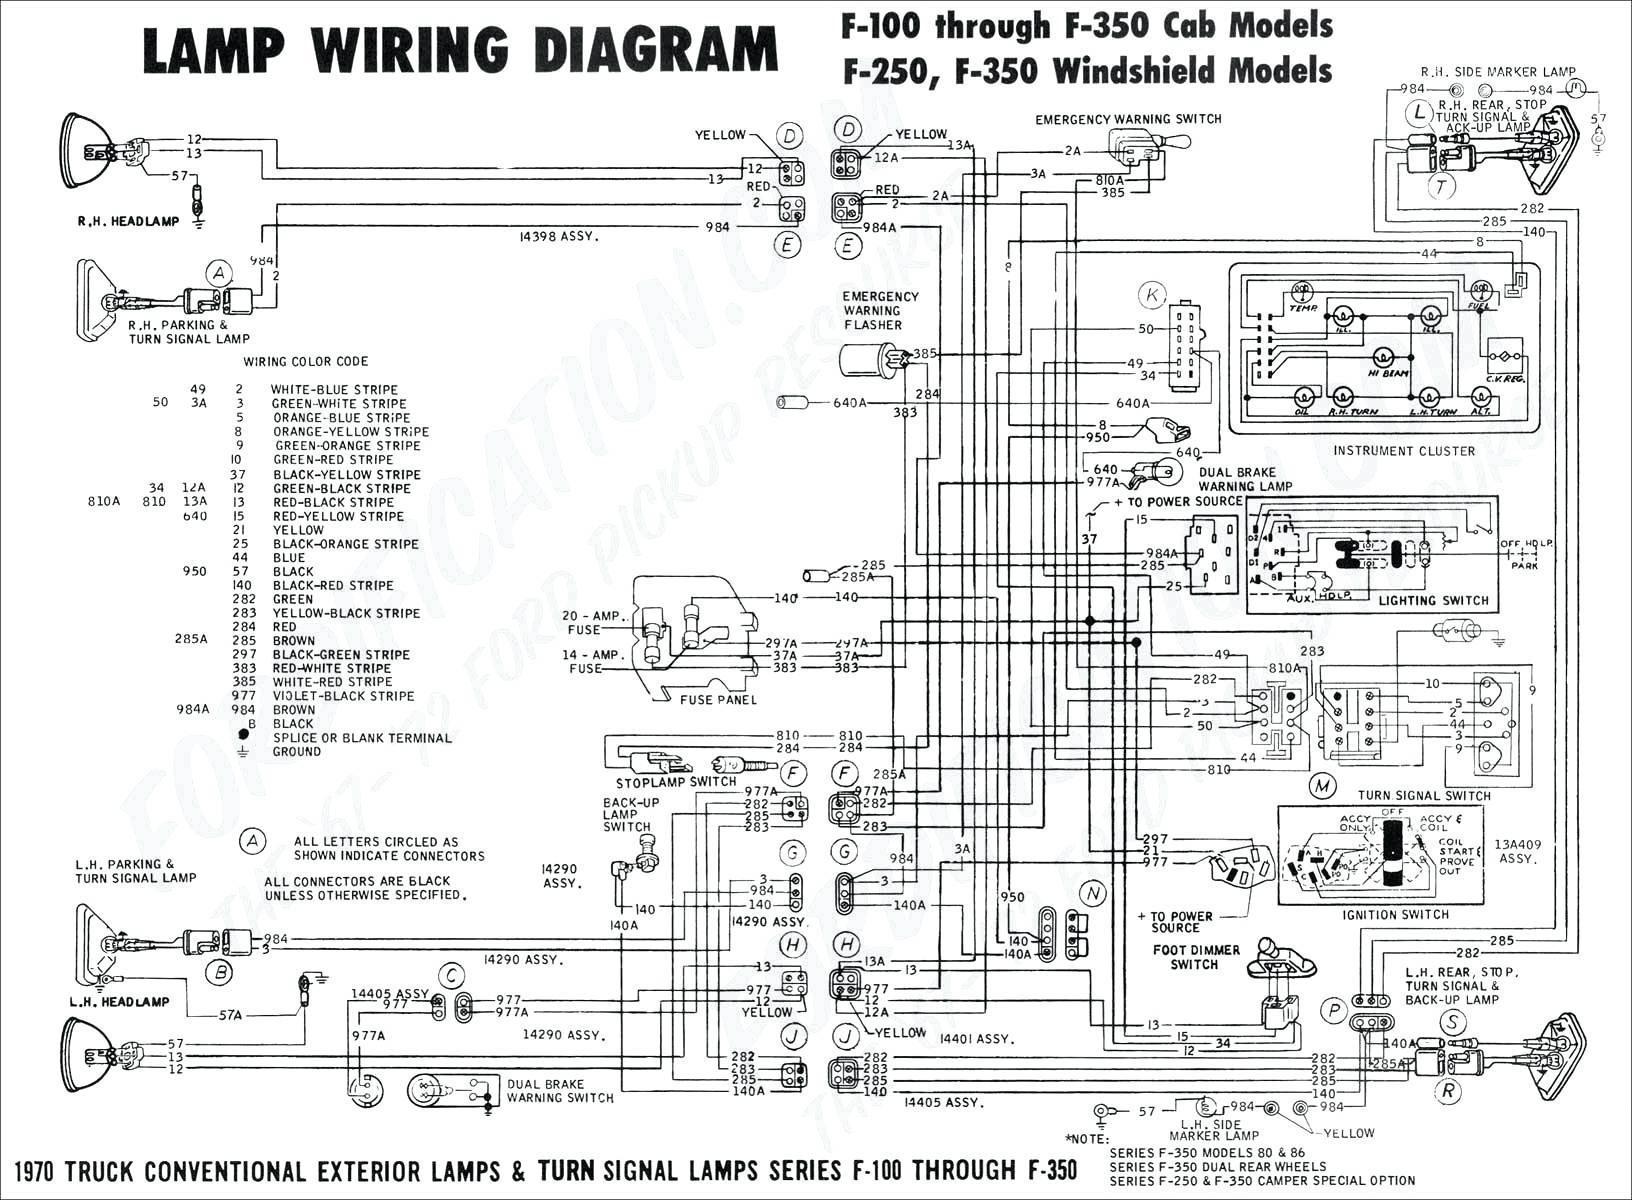 Club Car Parts Diagram Front End 1999 Chevy Malibu Rear End Diagram Wiring Diagram Services • Of Club Car Parts Diagram Front End